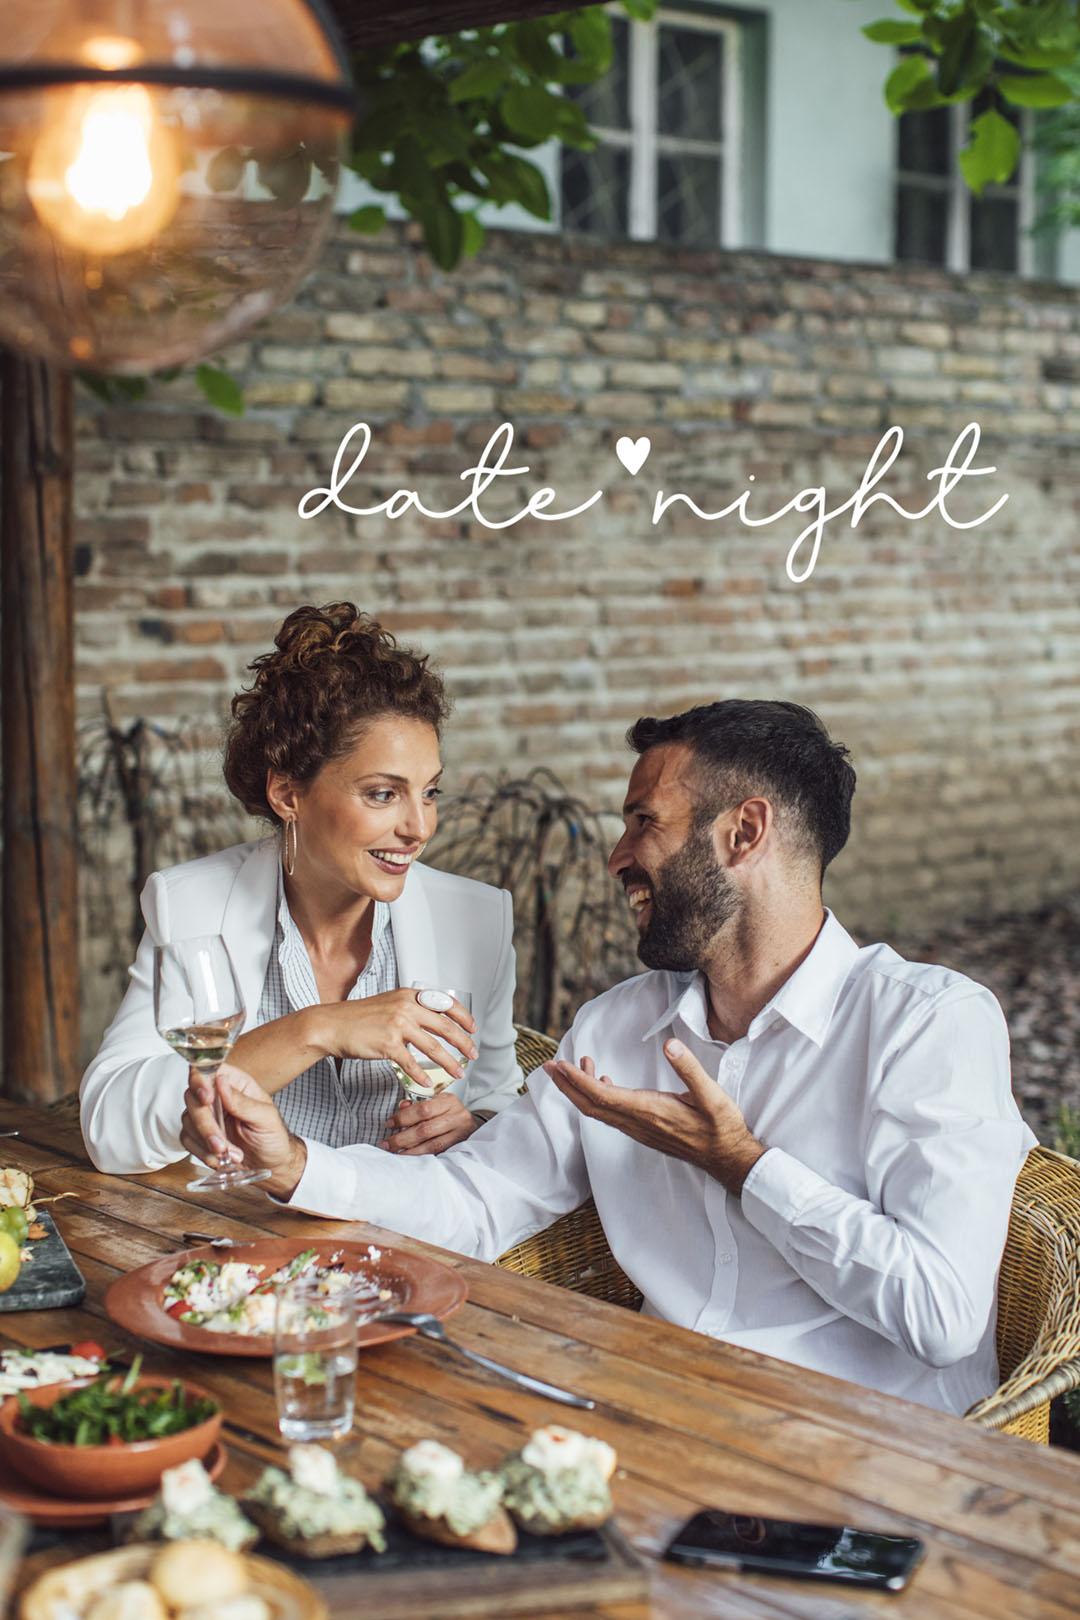 Couple Enjoying Wine and Food at Restaurant